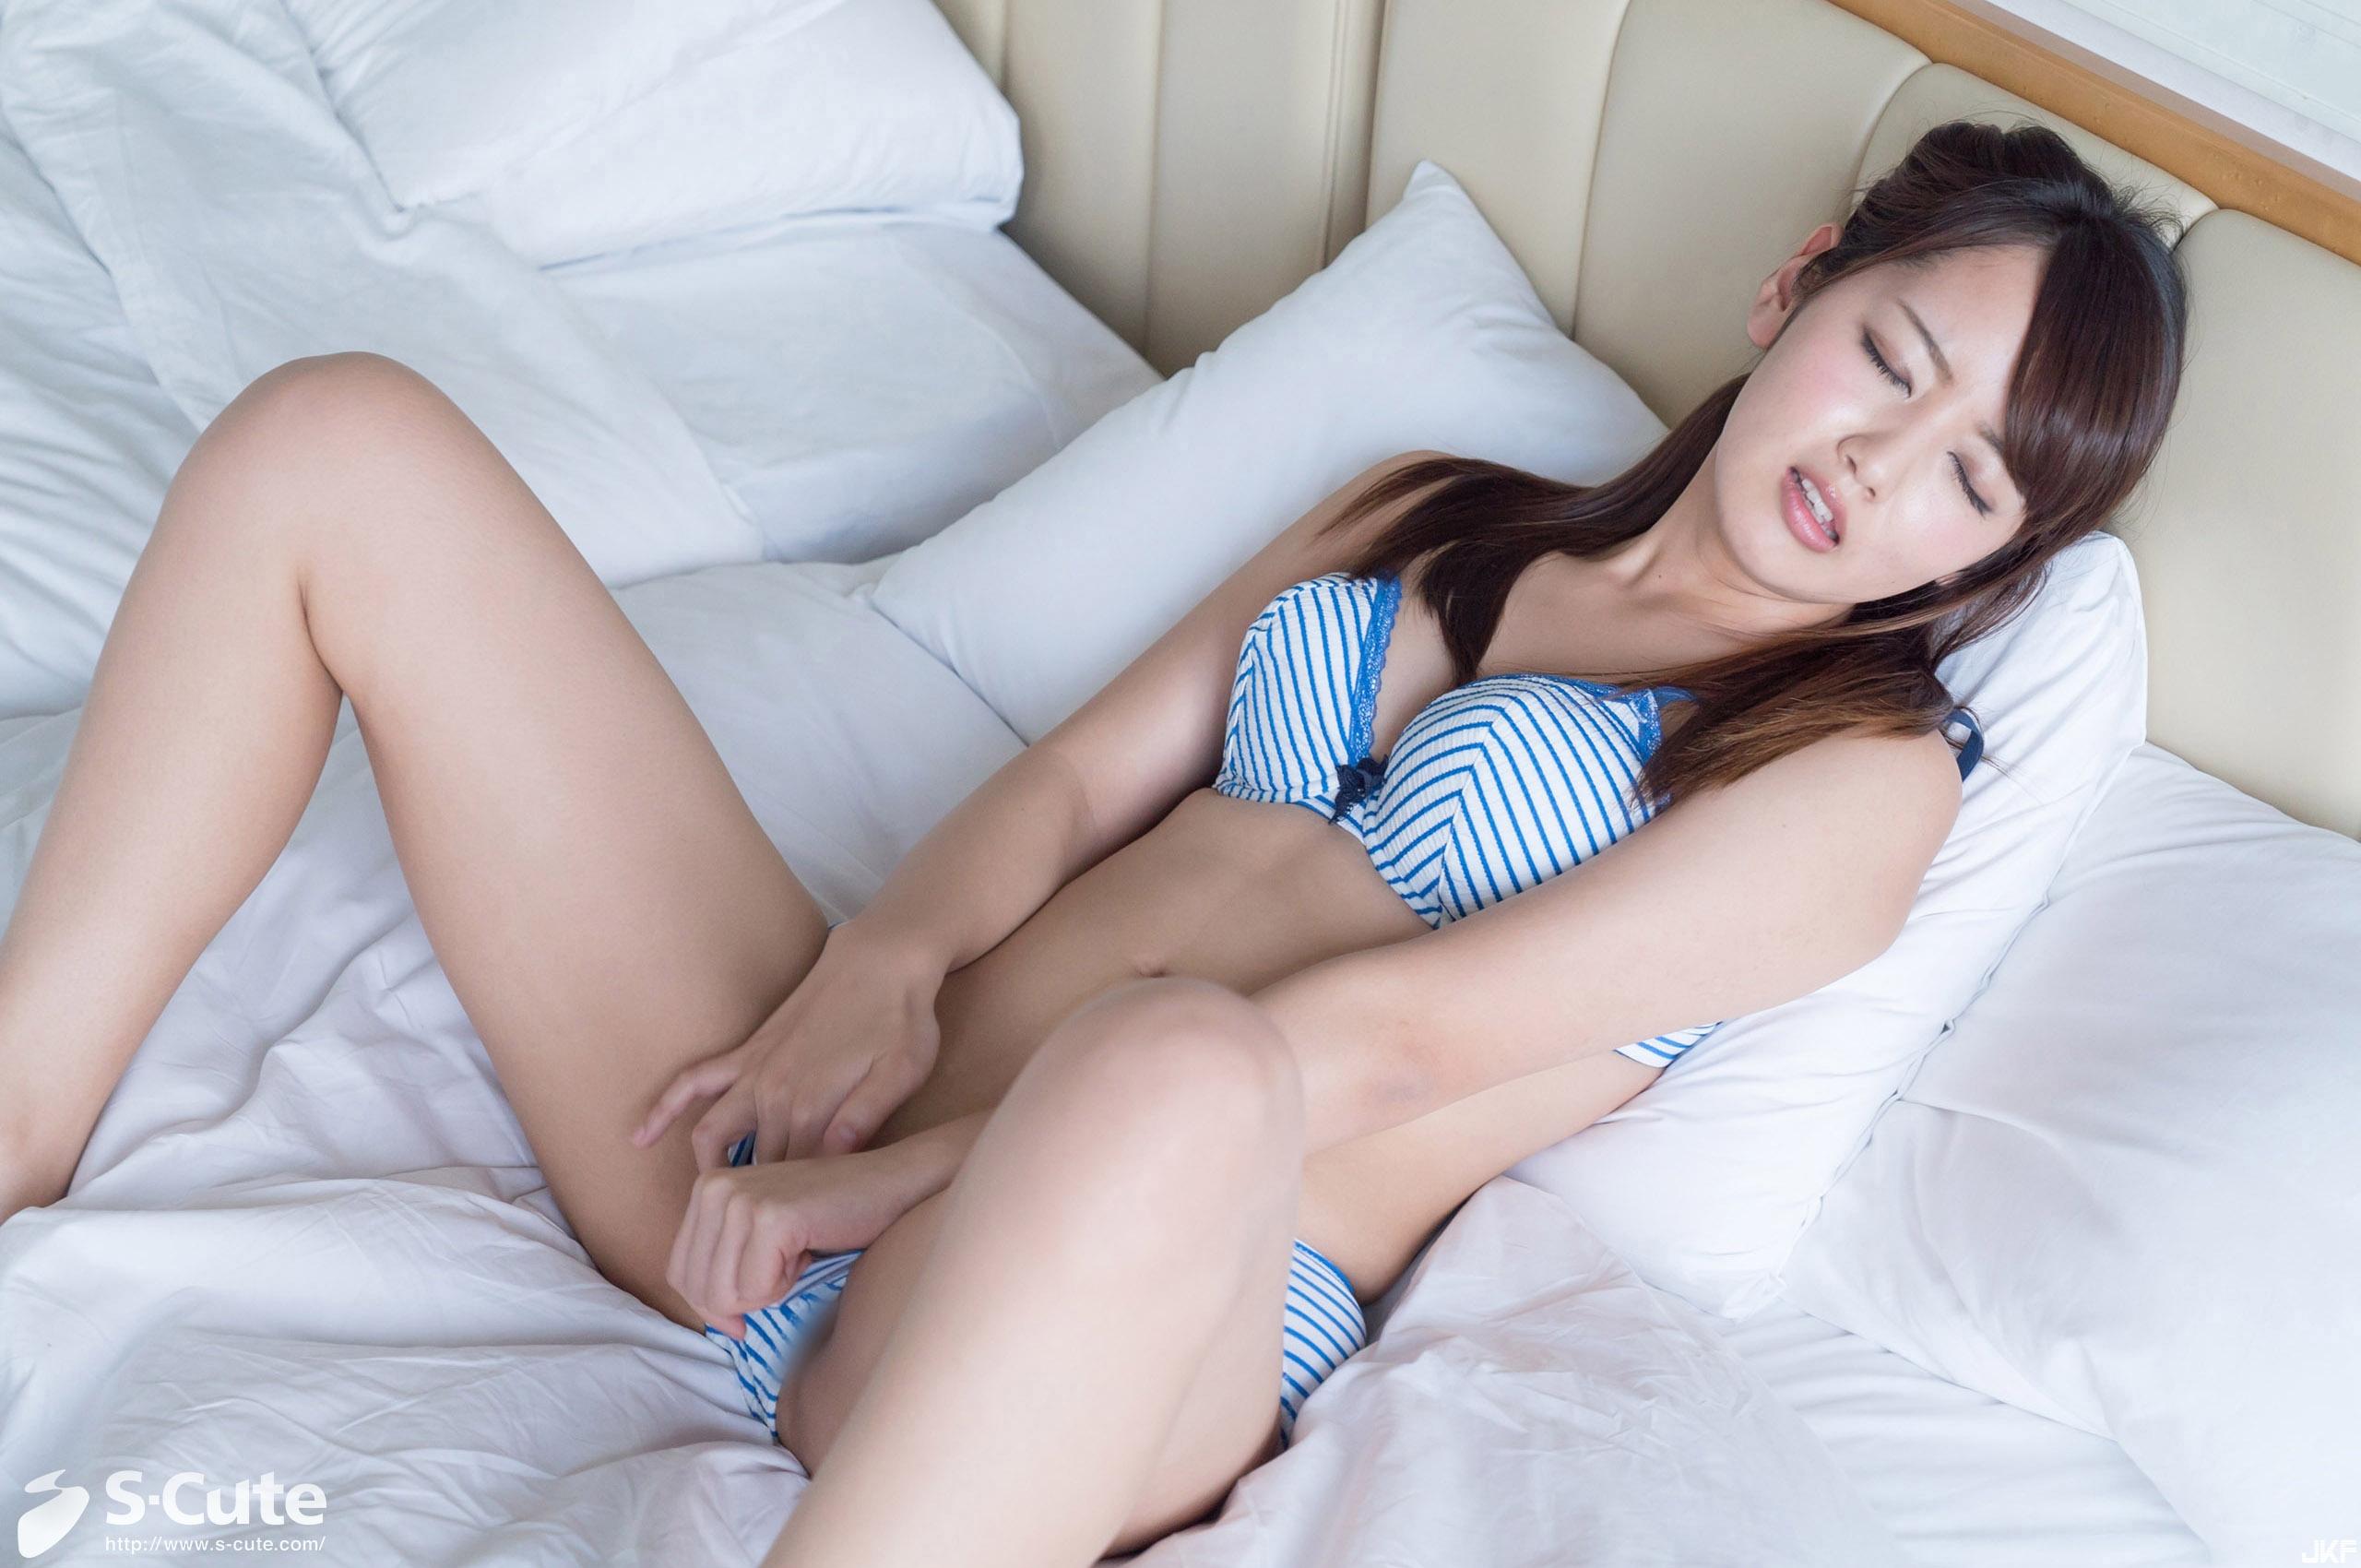 440_kanna_04-011.jpg